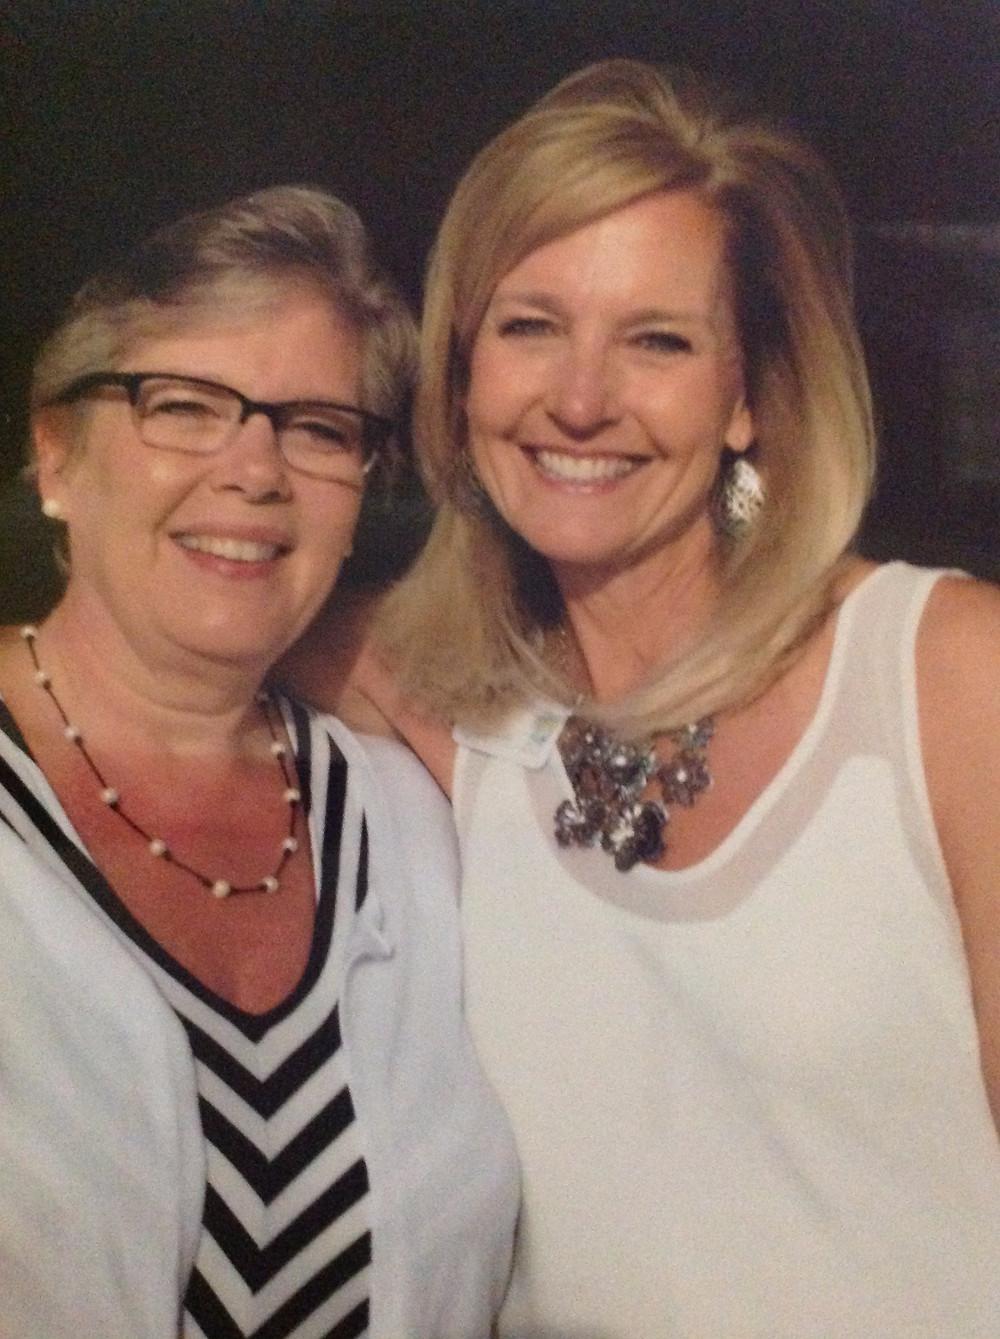 Cindy and Terri